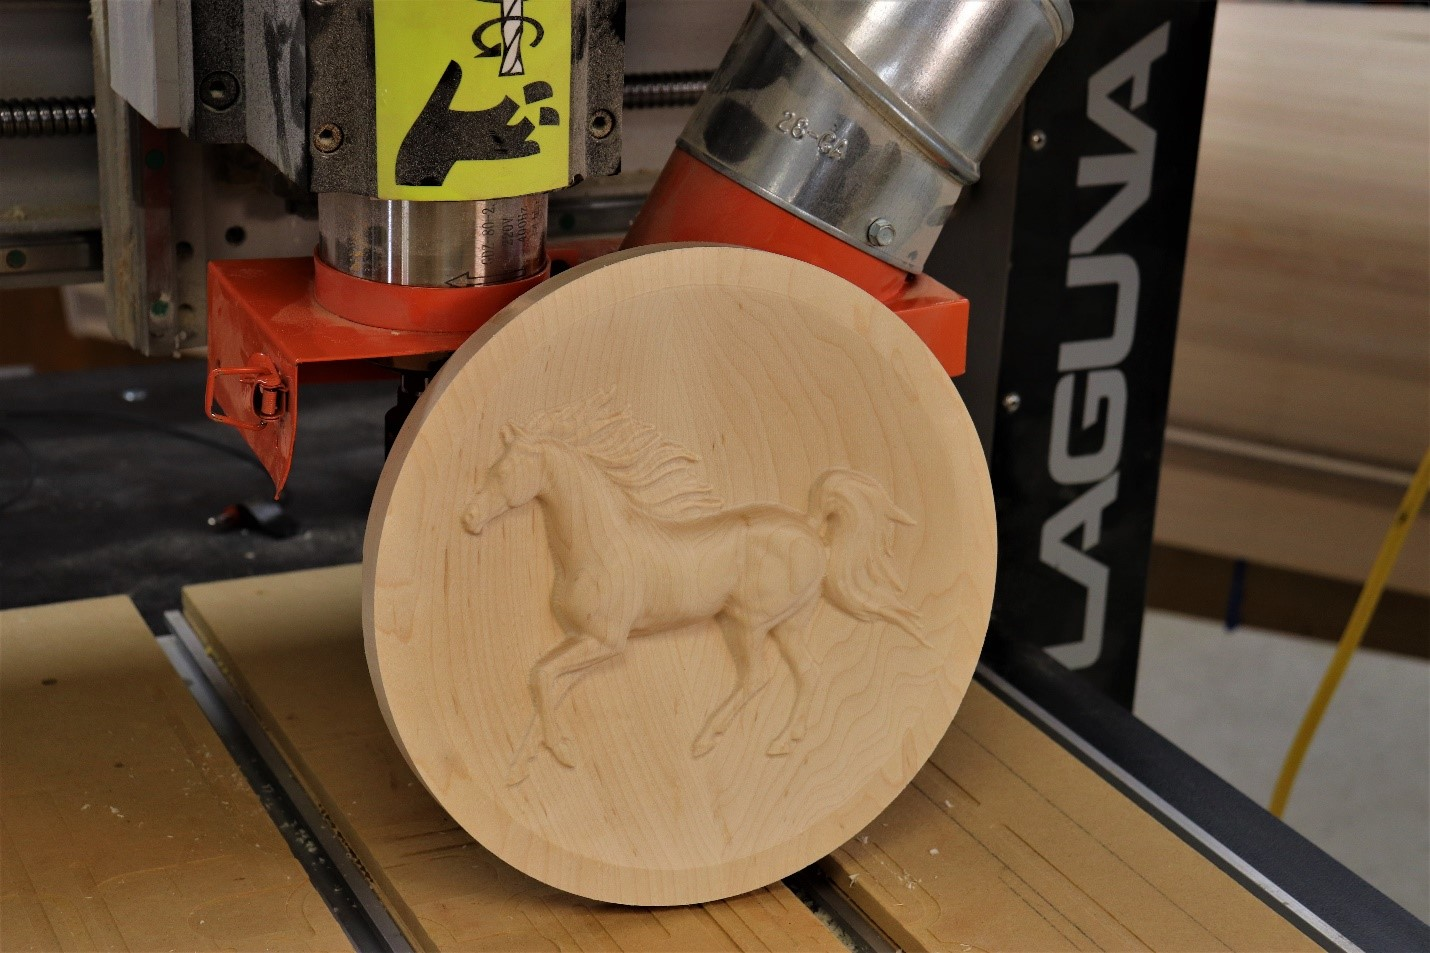 CNC: Cutting 3D Clipart